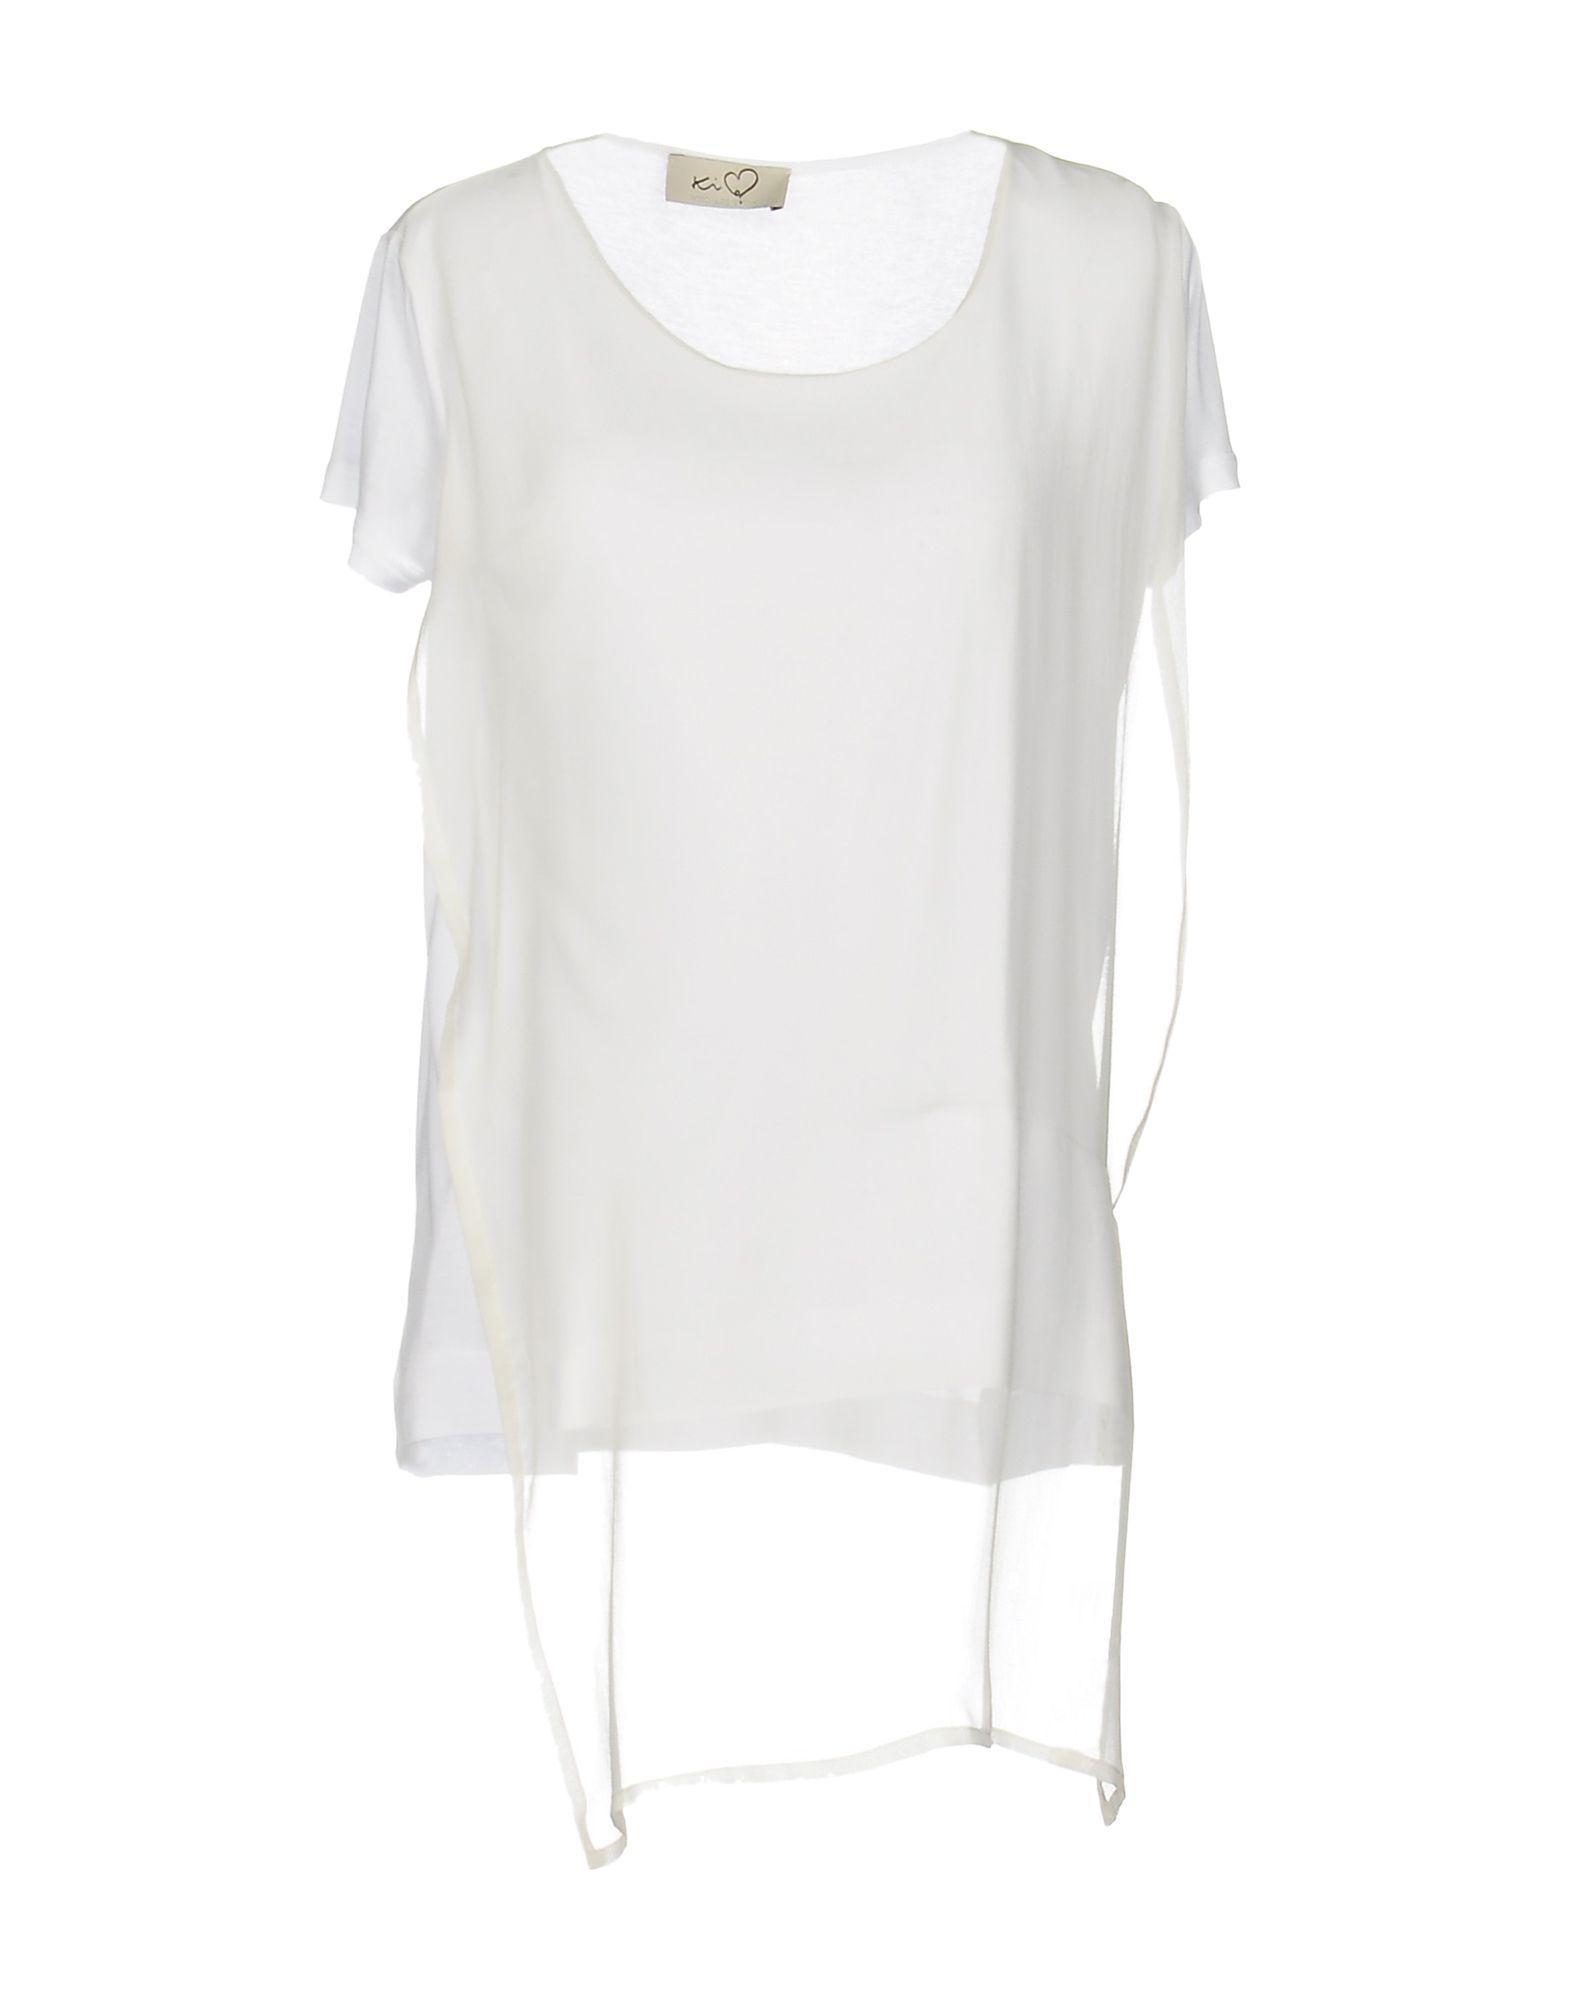 SHIRTS - Shirts Ki6? Who are you? Cheap Sale Inexpensive 0wOYoPO6o6